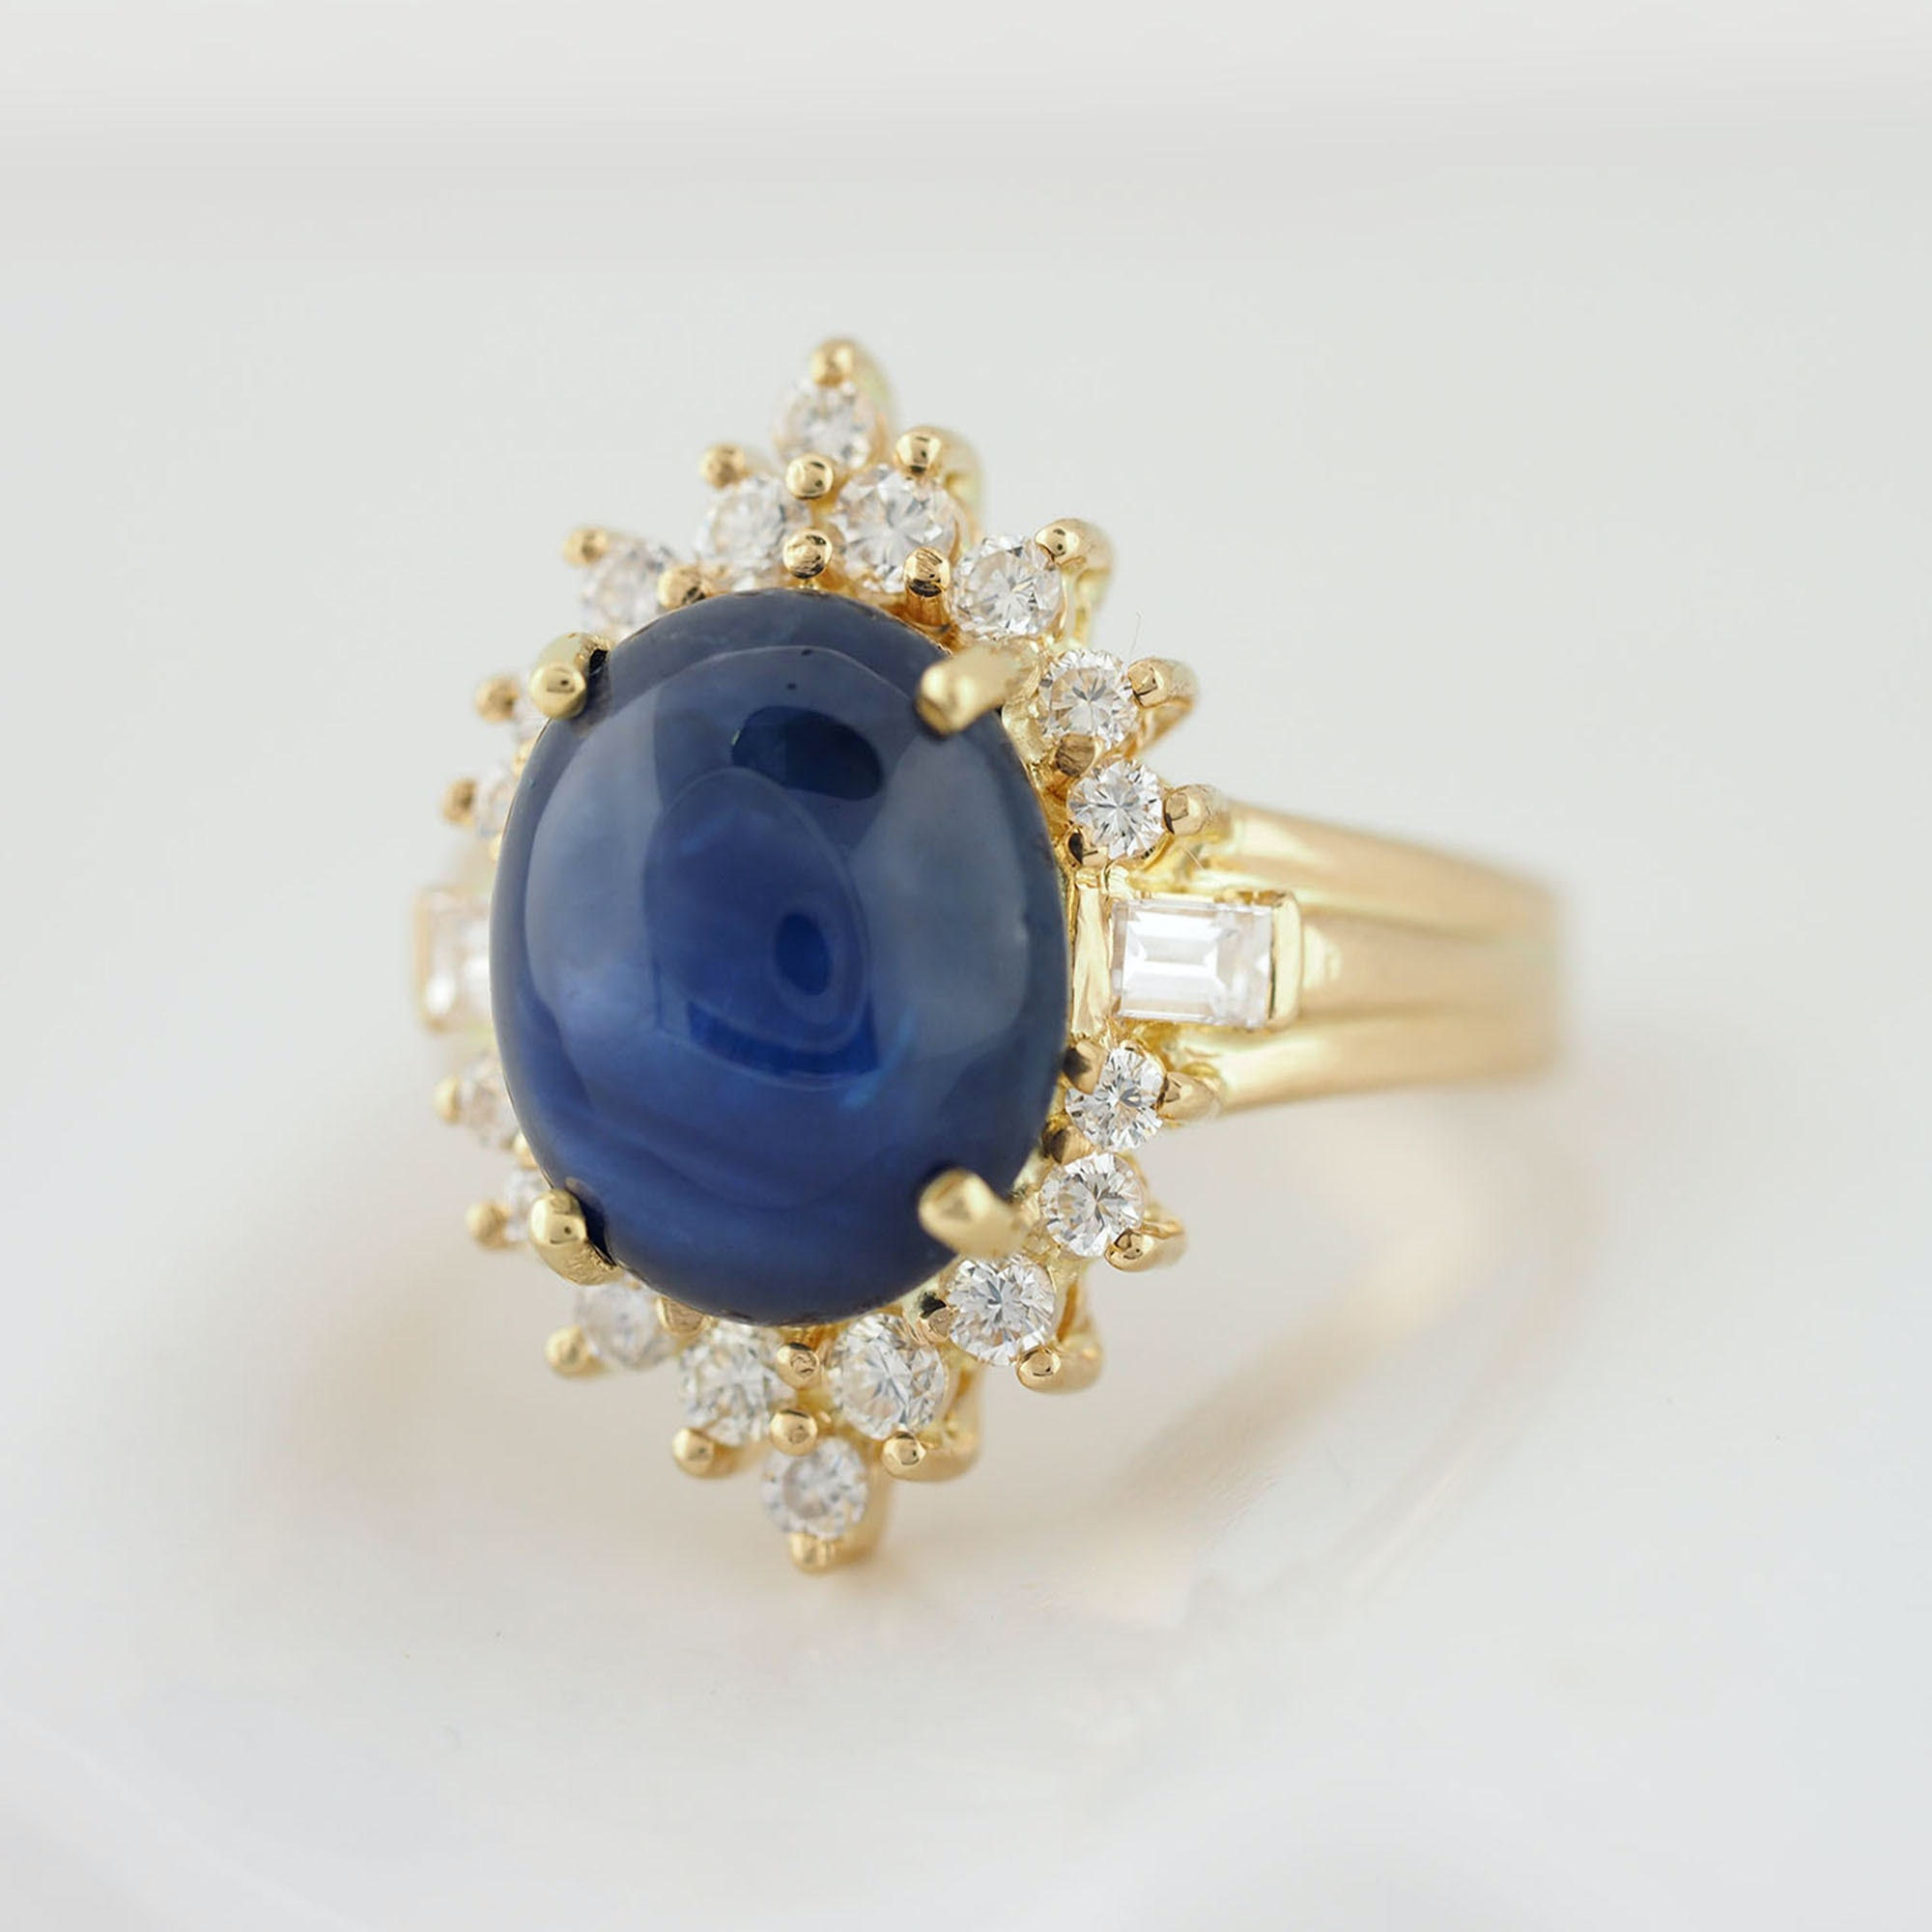 18K Yellow Gold 6.90 CT Sapphire and Diamond Ring